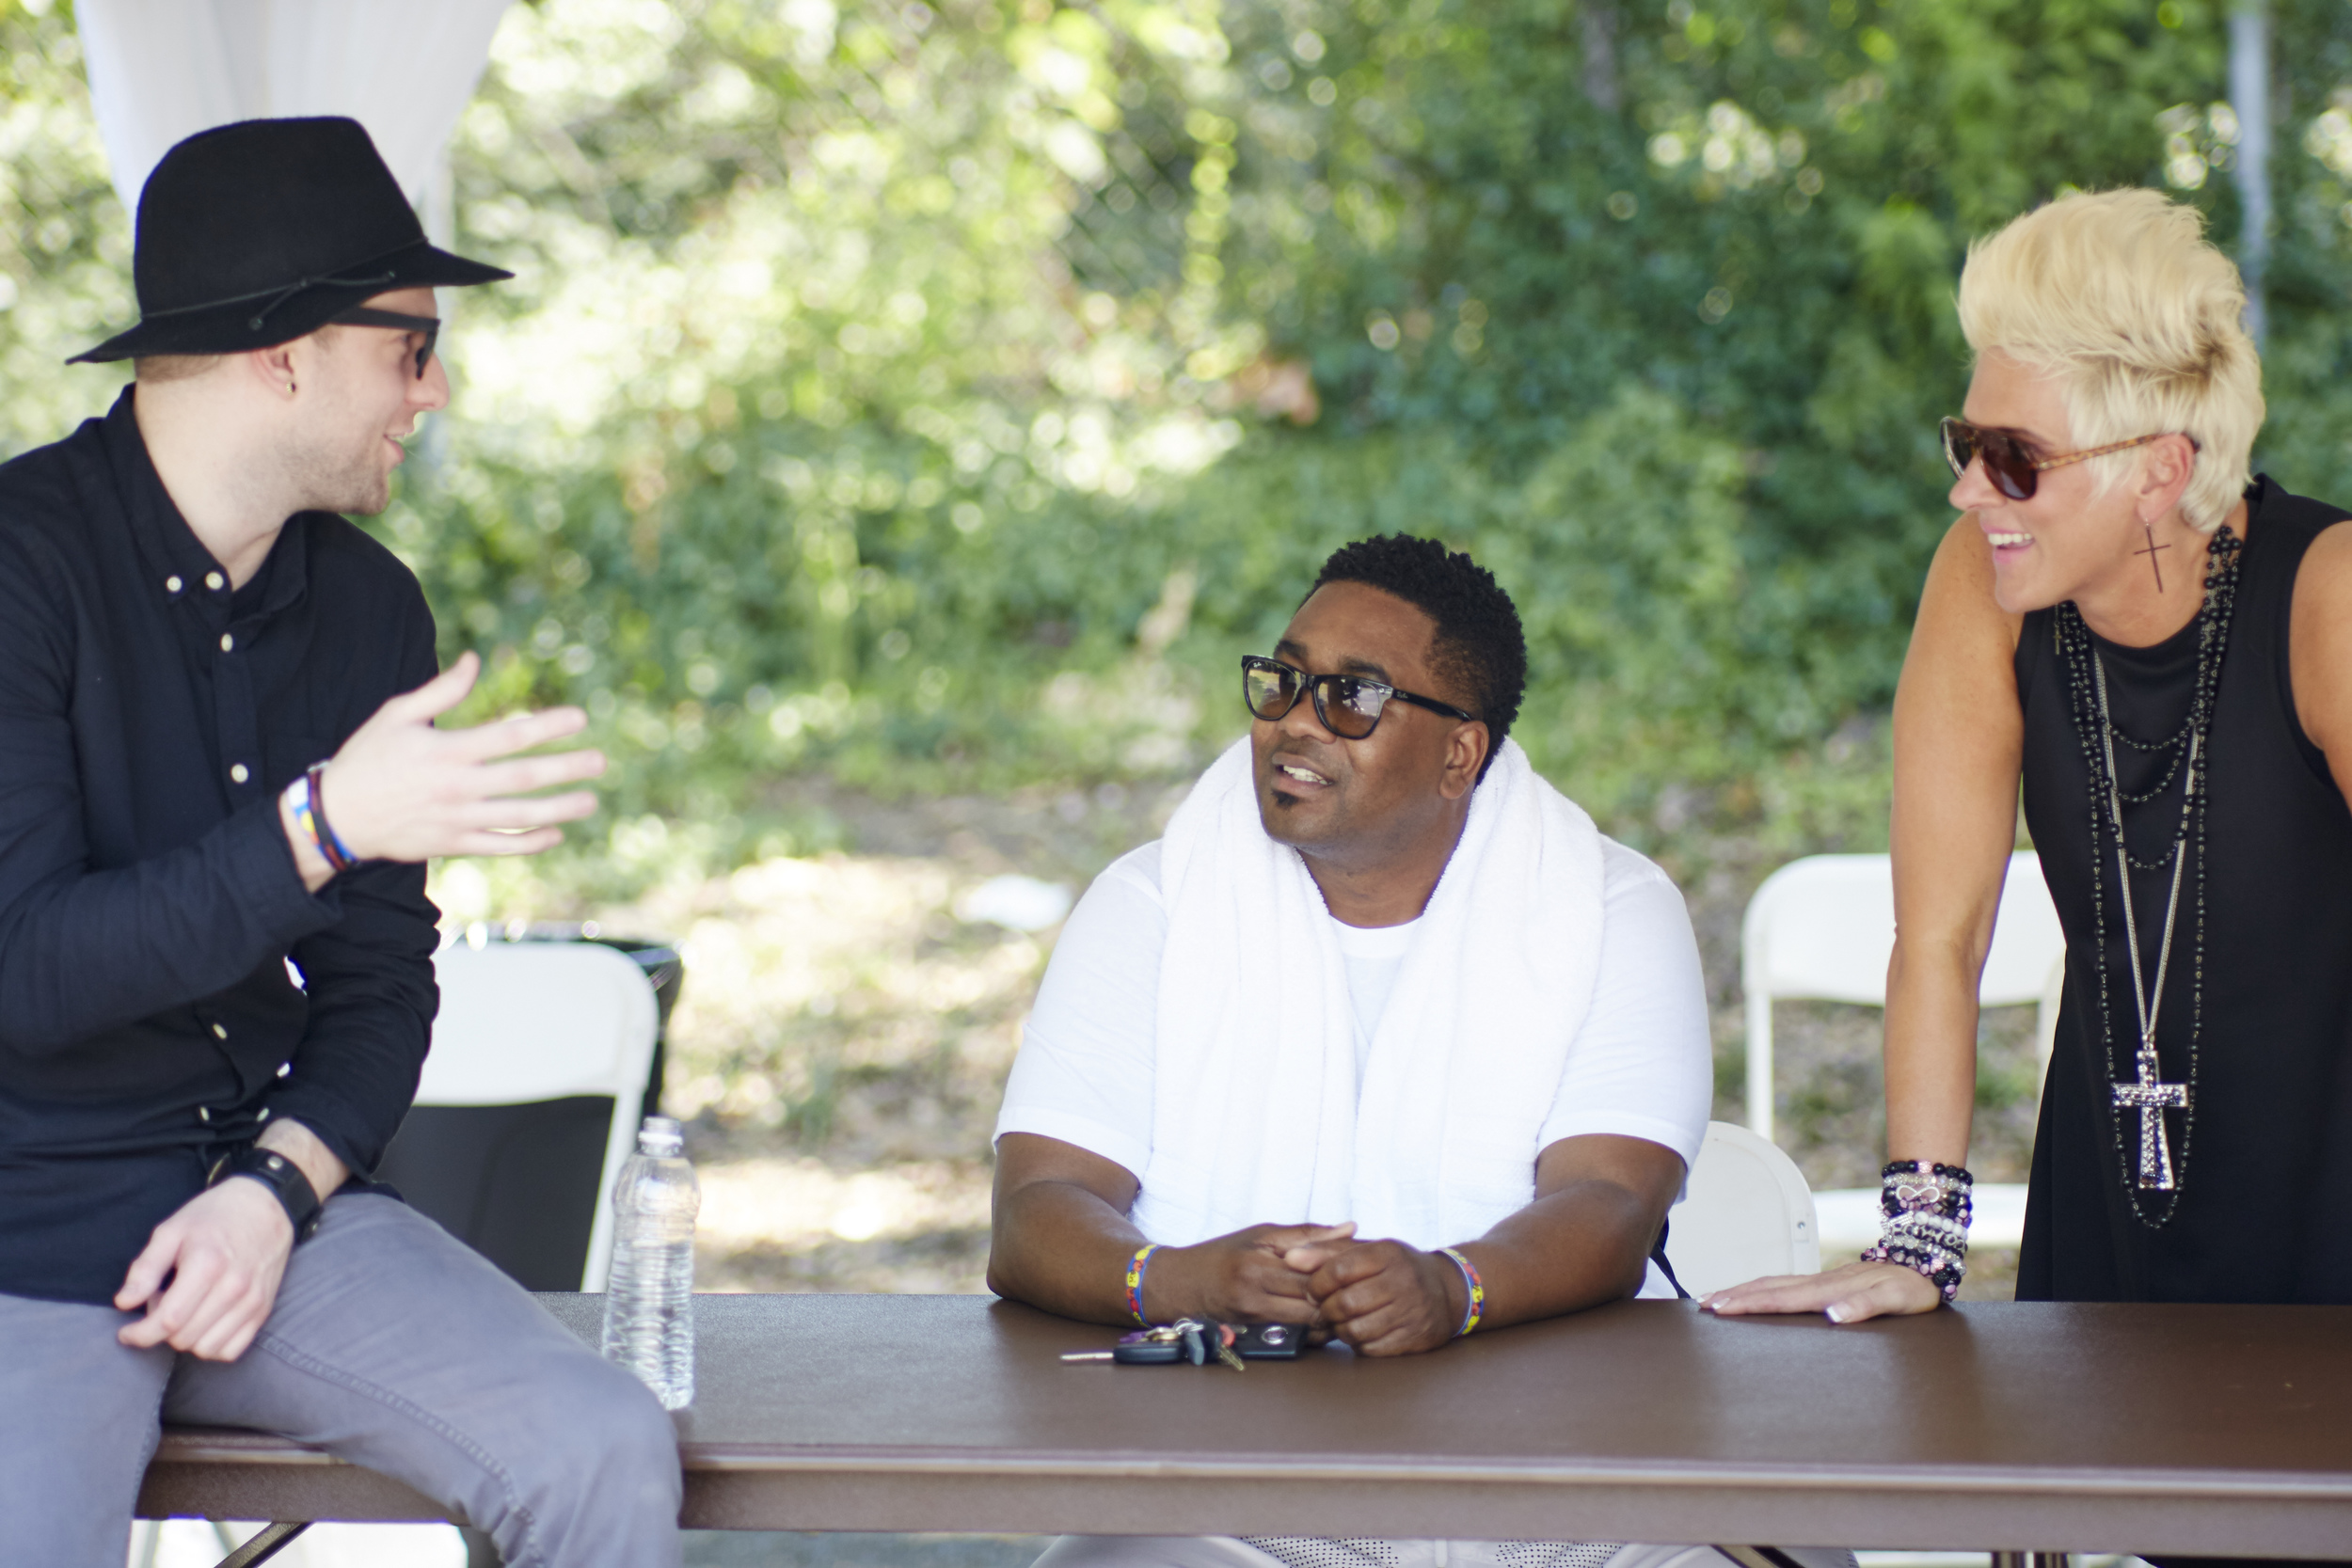 Pastors Judah, Canton and Kim converse in a scene from Preachers of Atlanta (Oxygen Media)